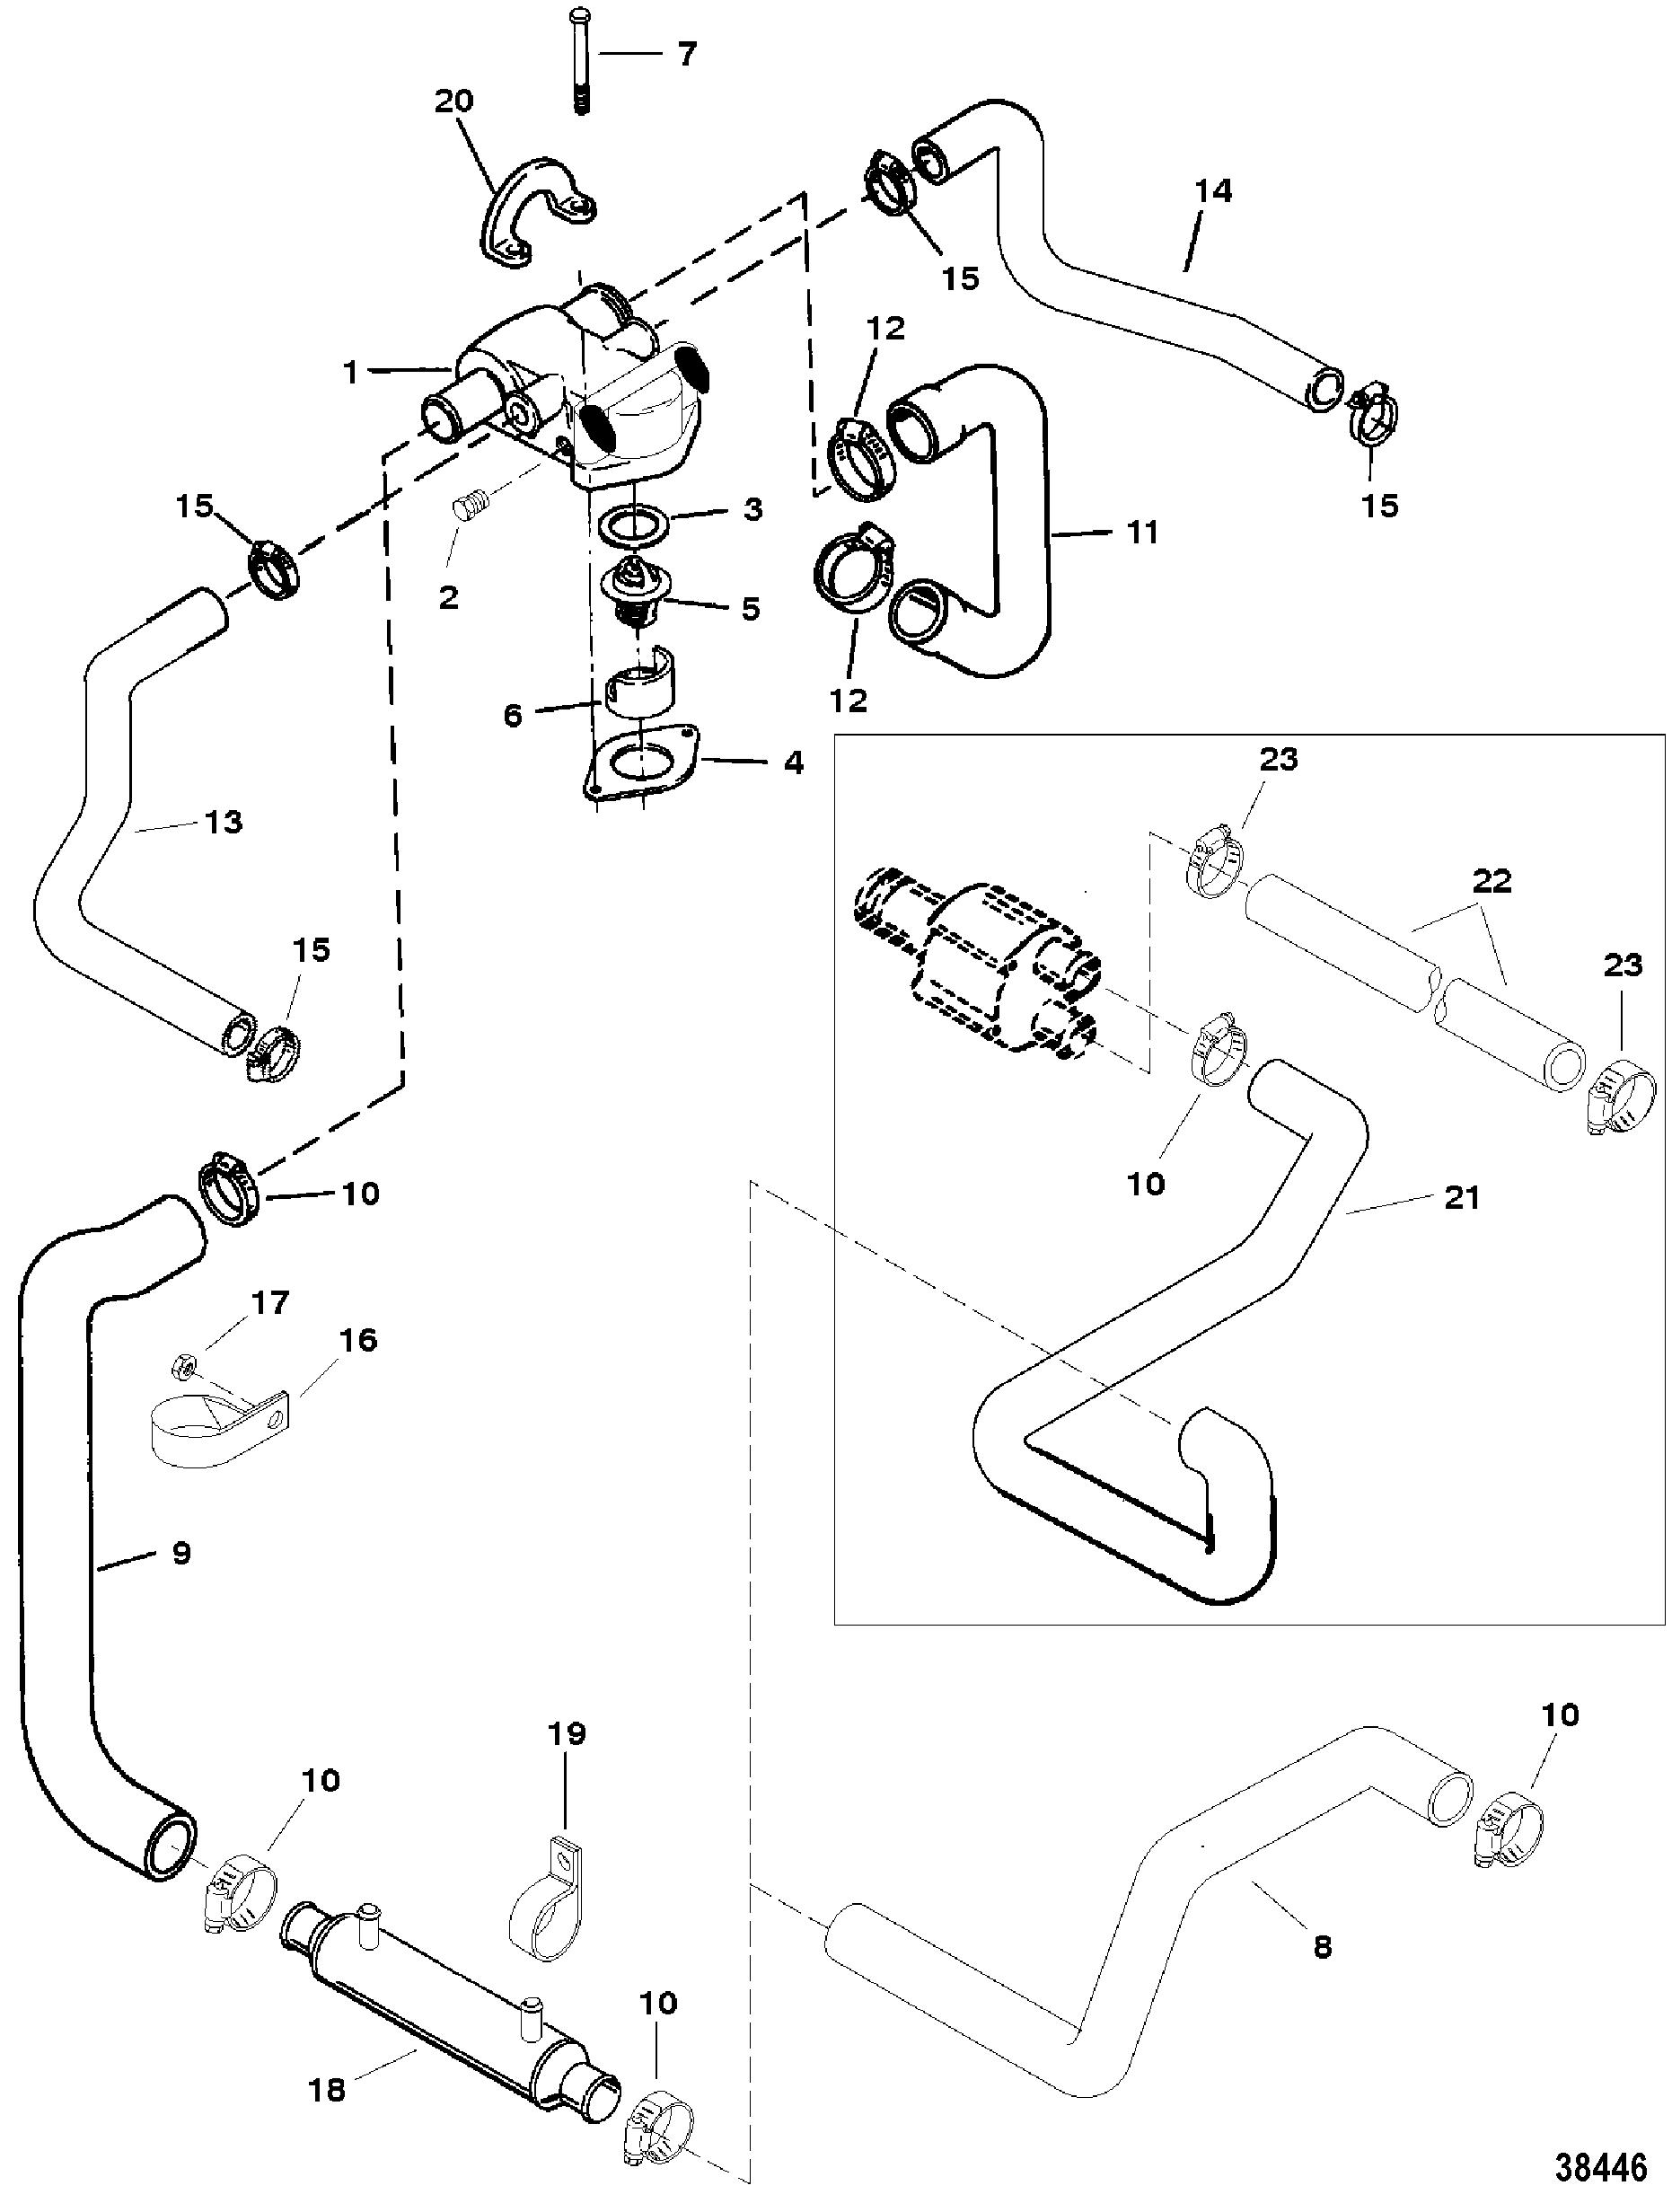 43 gm coolant flow diagram wiring diagram database 38446 43 gm coolant flow diagramhtml